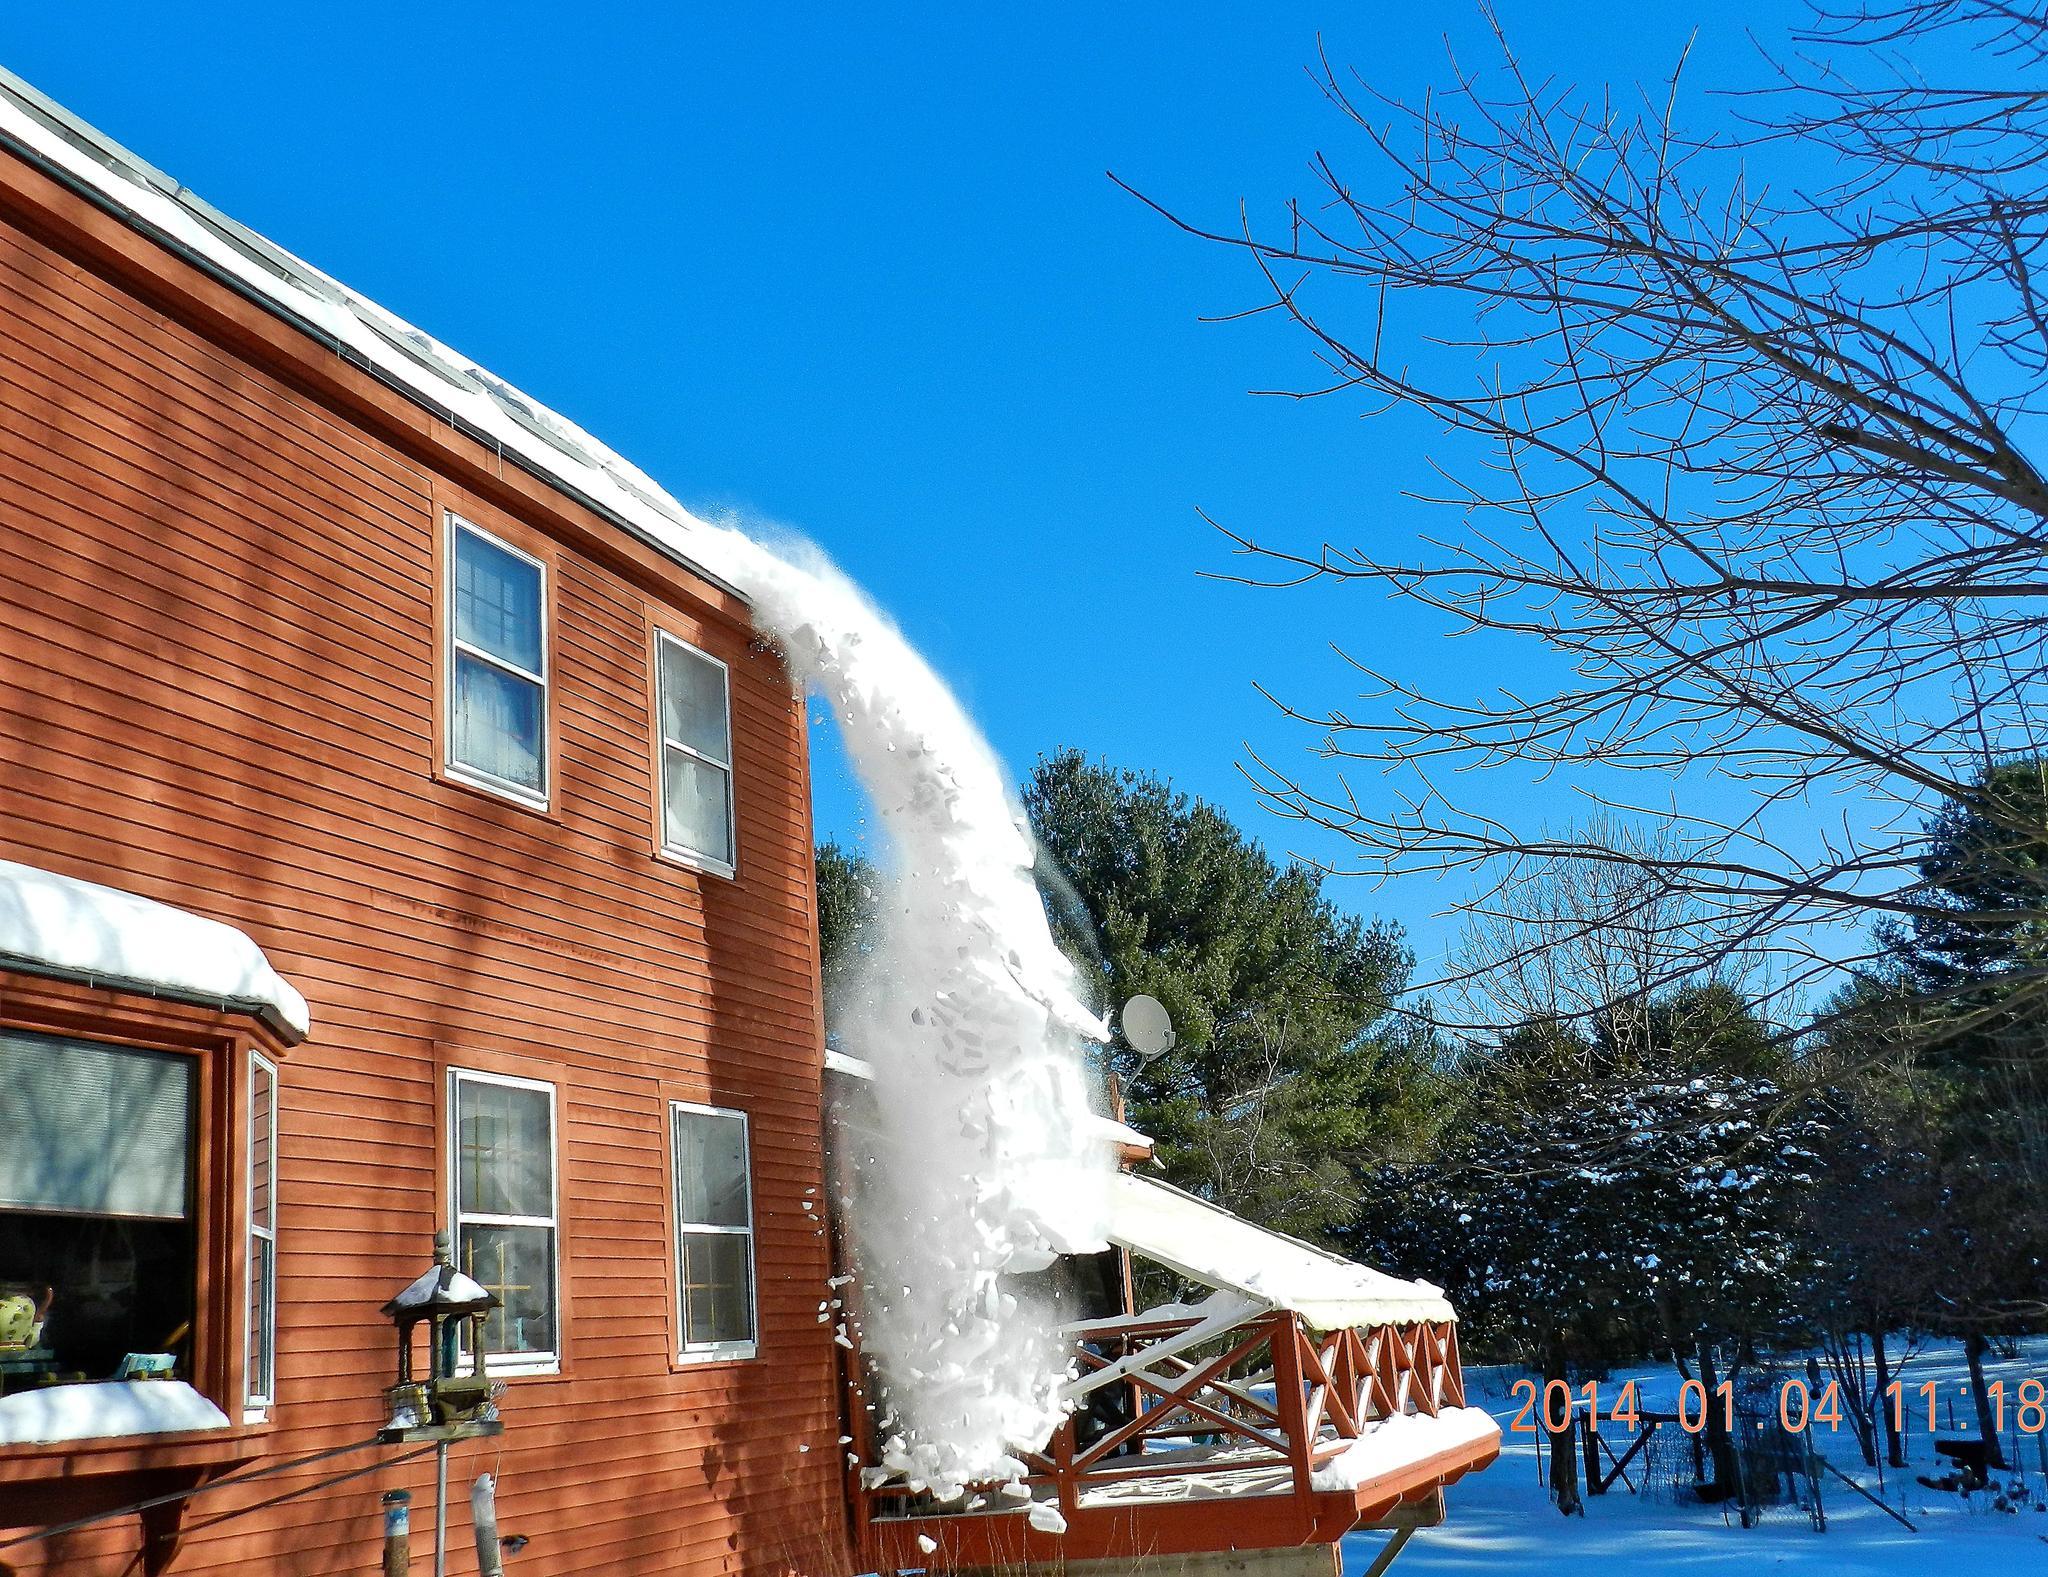 New England Clean Energy Profile Amp Reviews 2019 Energysage